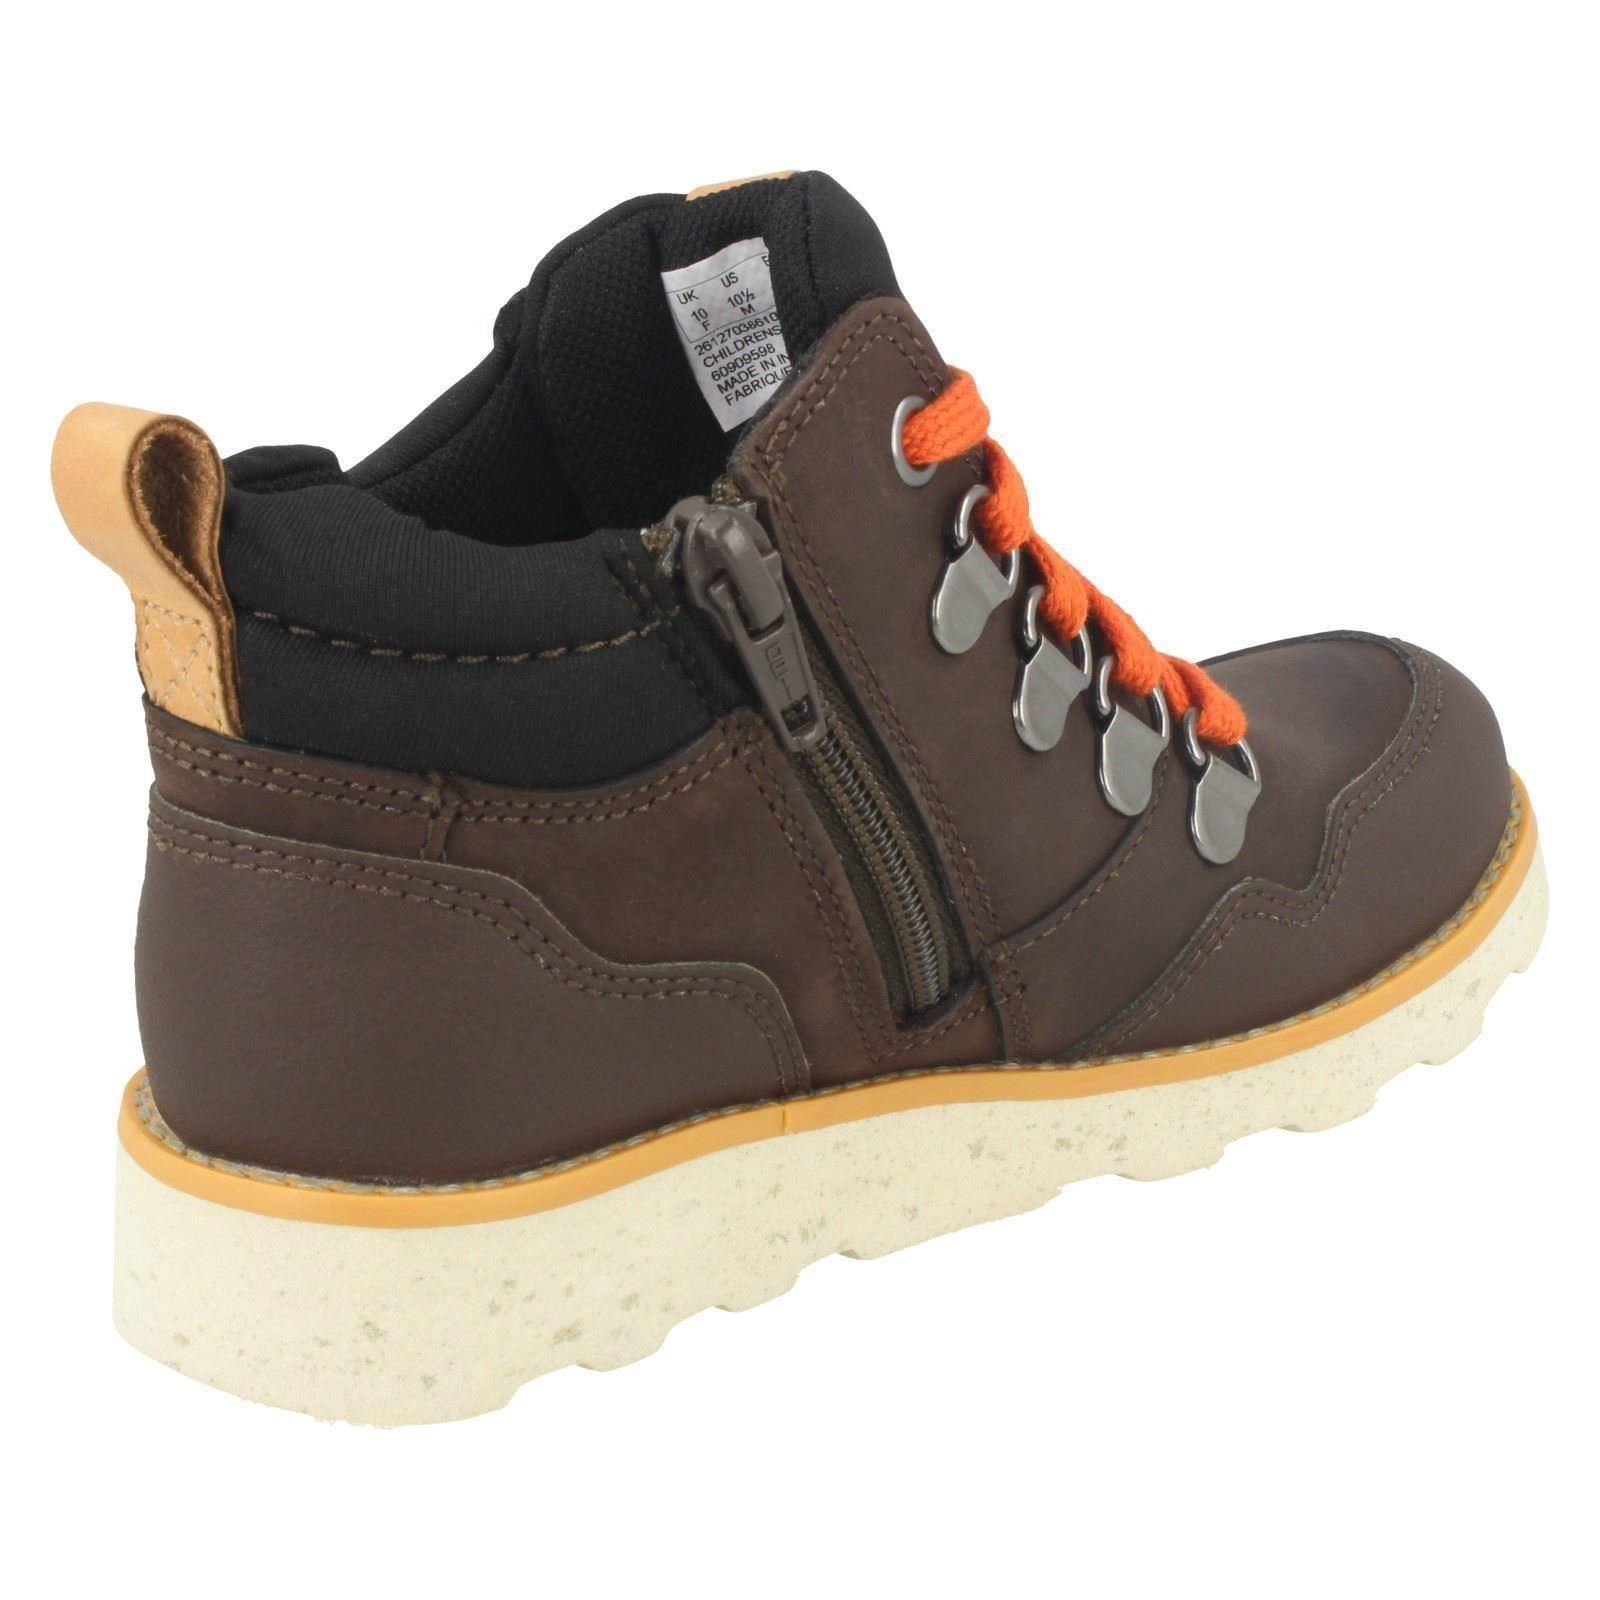 Boys Clarks Casual Ankle Boots Dexy Hi Gtx